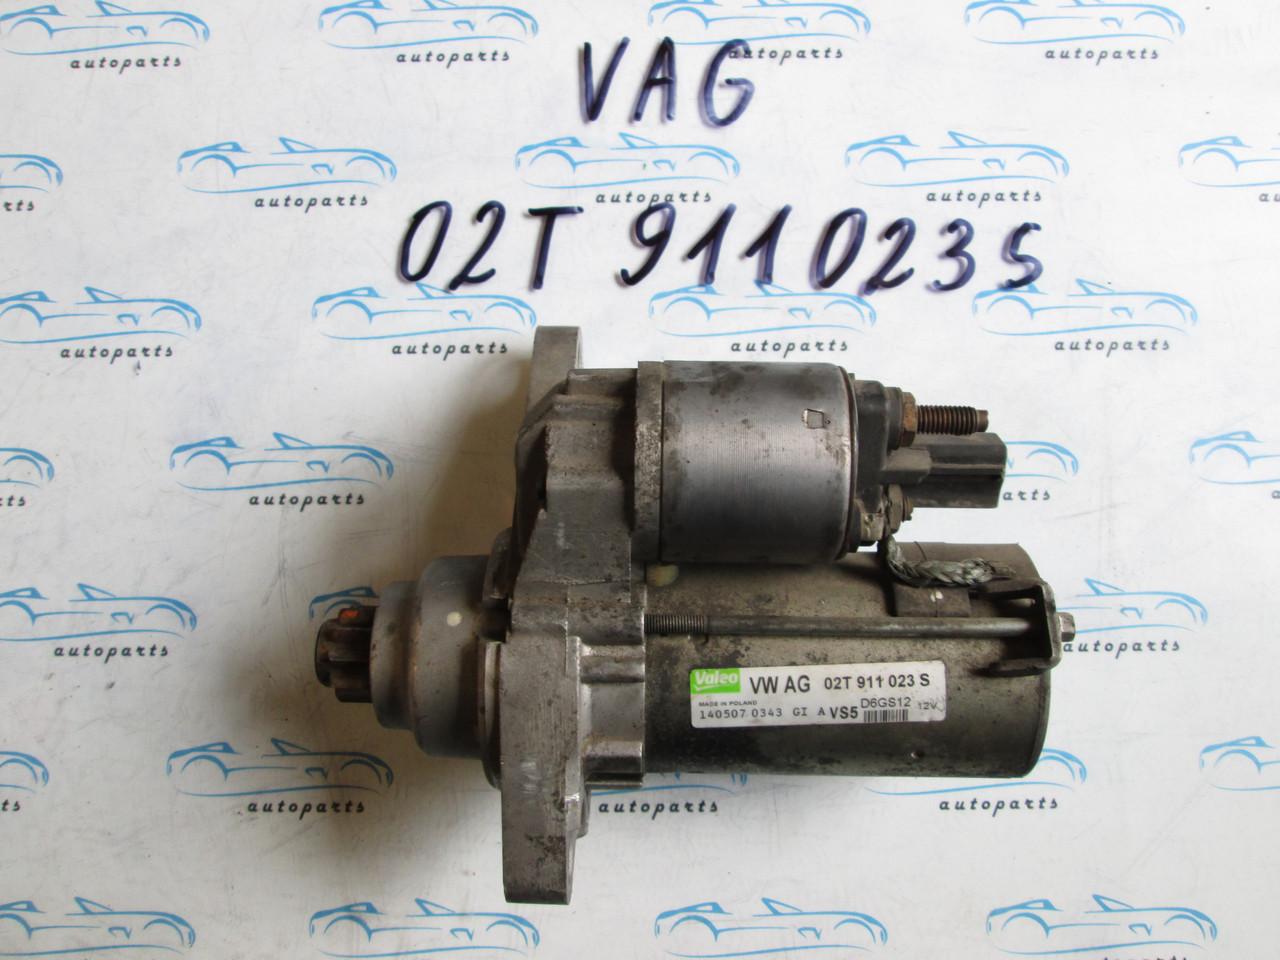 Стартер VAG 02T911023S, D6GS12